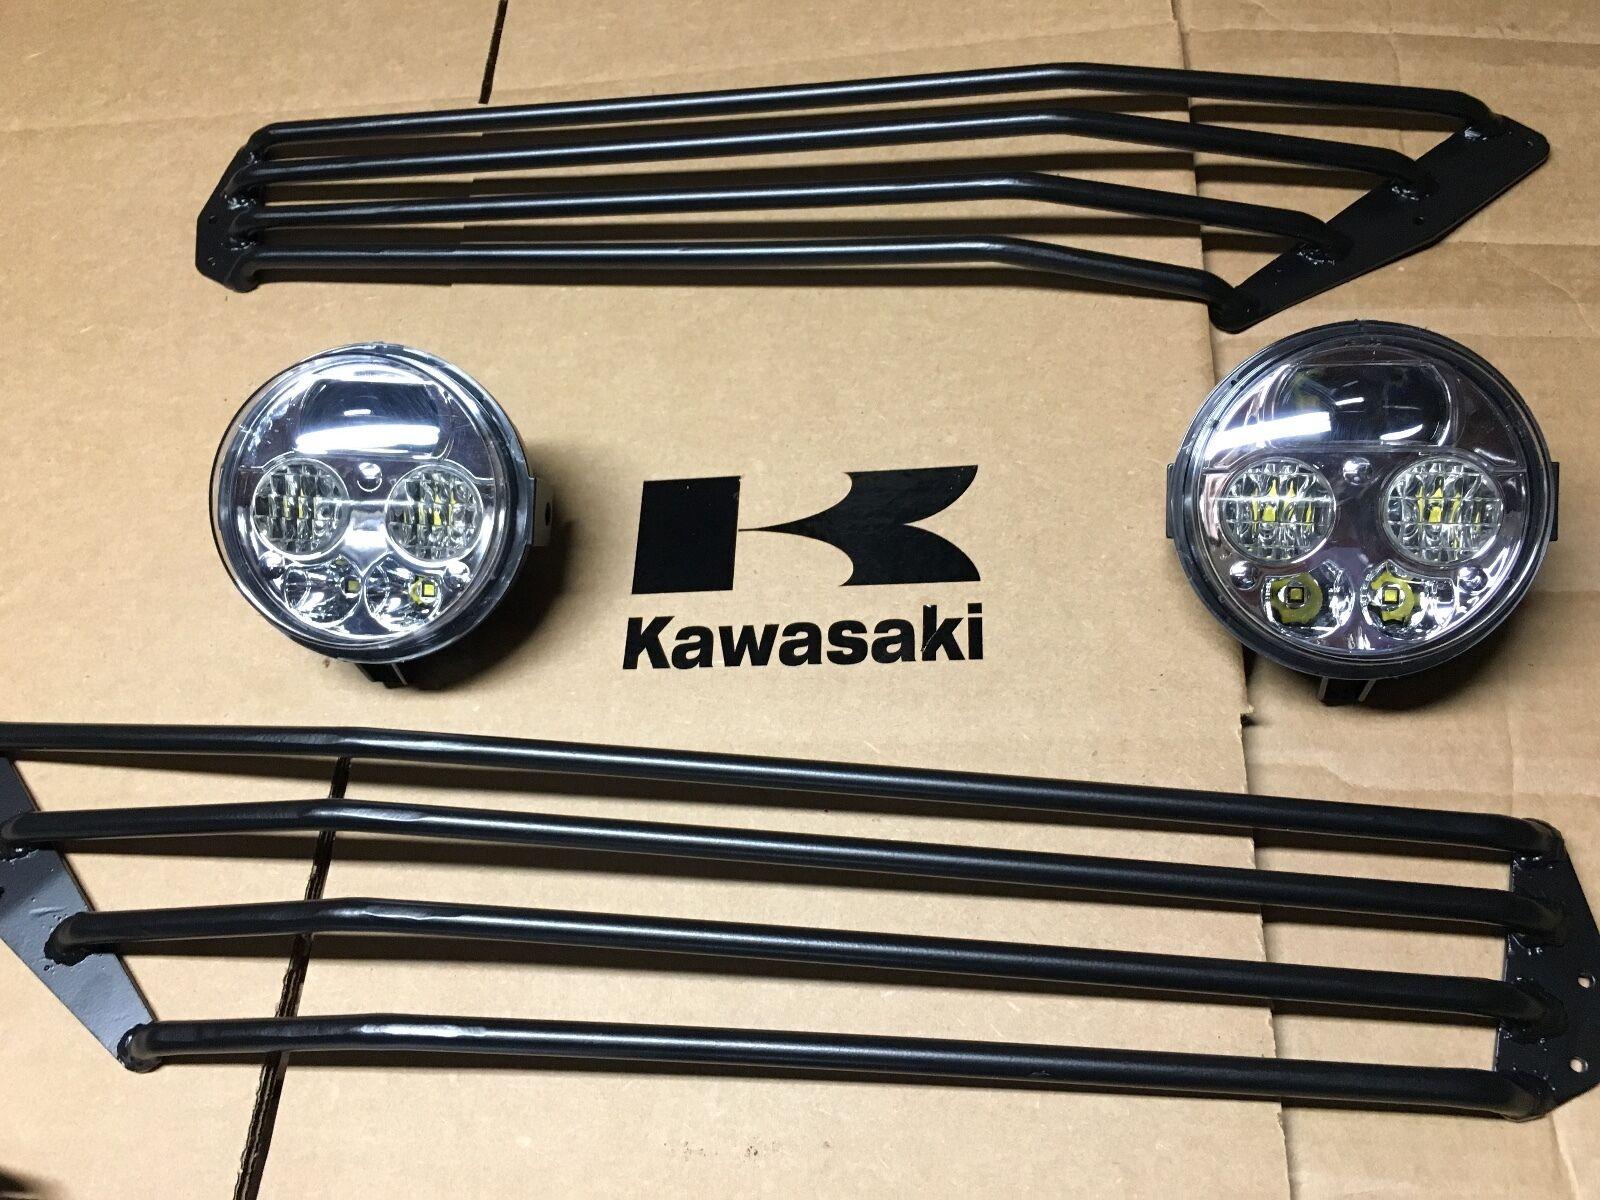 10-15 KAWASAKI TERYX LED HEADLIGHTS CONVERSION KIT+ GUARDS!! USA - teryx4